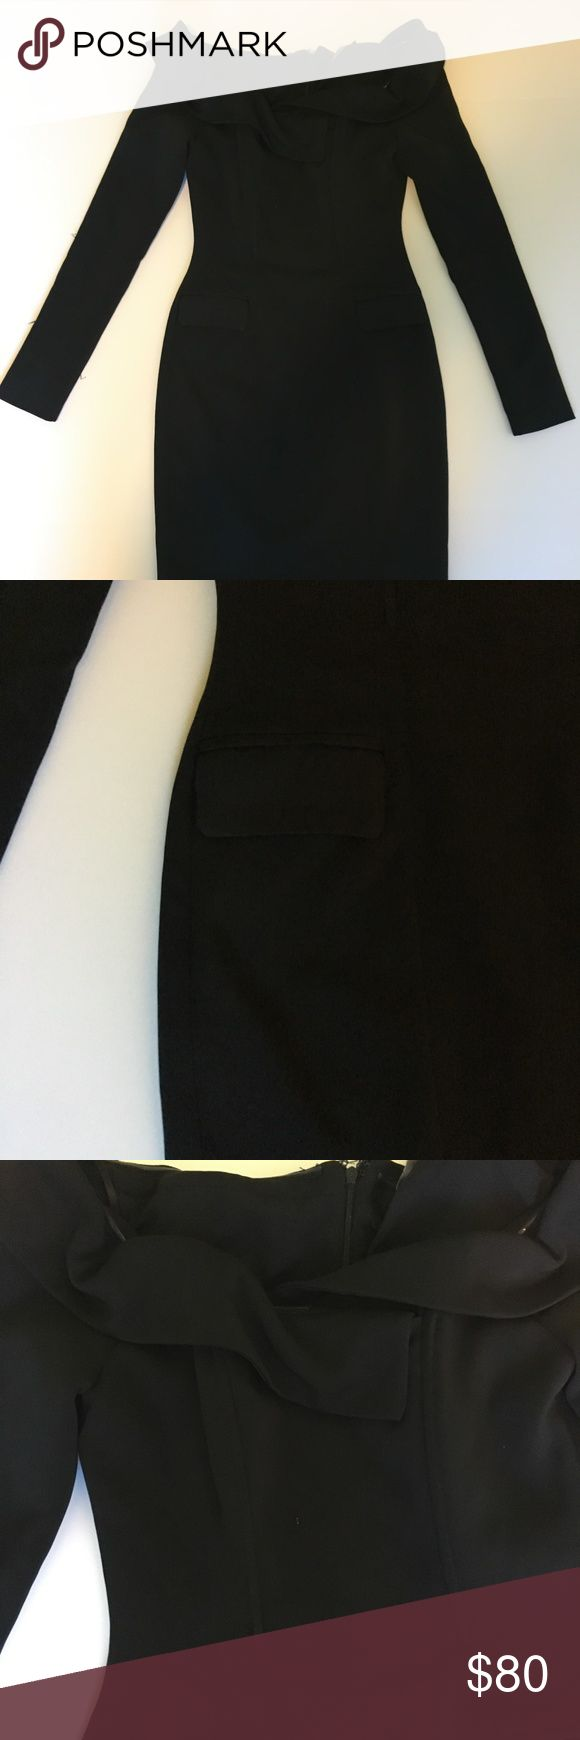 "Lavish Alice Shoulderless Mini Brand: Lavish Alice  Size: US 4 UK8 EUR36  Condition: Gently Used  Retail Price: $215  Color: Black  Style: Off Shoulder Armpit to armpit: 15"" Waist: 12"" Length Shoulder to Hem: 26"" Skirt Sweep (Bottom Hem): 16"" Fabric Content: 97% Polyester 3% Elastane Lining Content: NA Notes: Lavish Alice Dresses Mini"